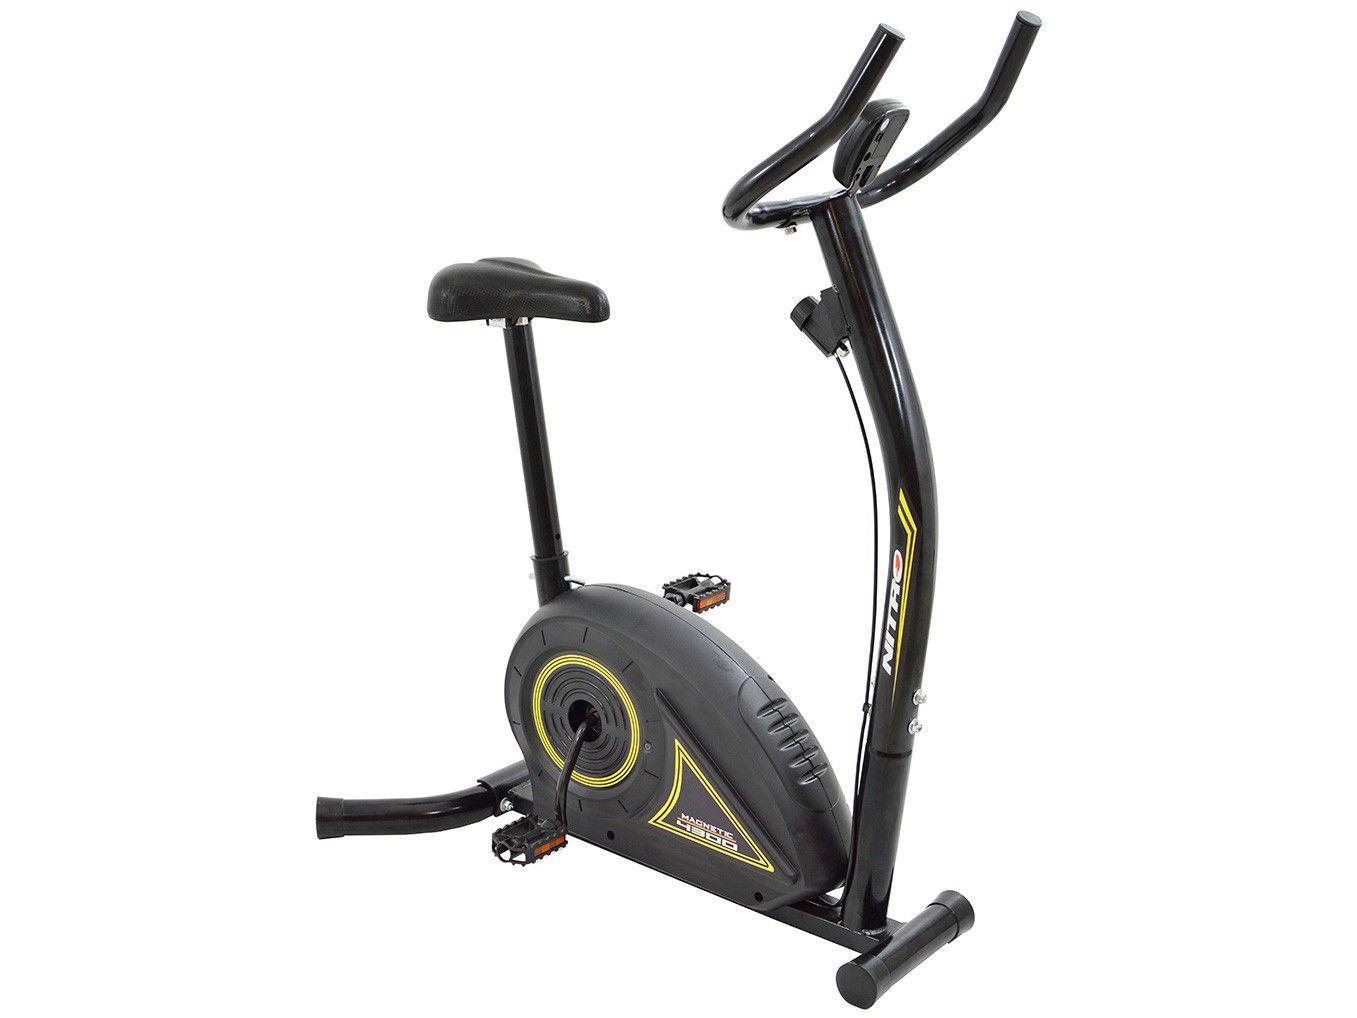 Bicicleta Ergométrica Polimet Nitro 4300 Magnética - 5 Funções